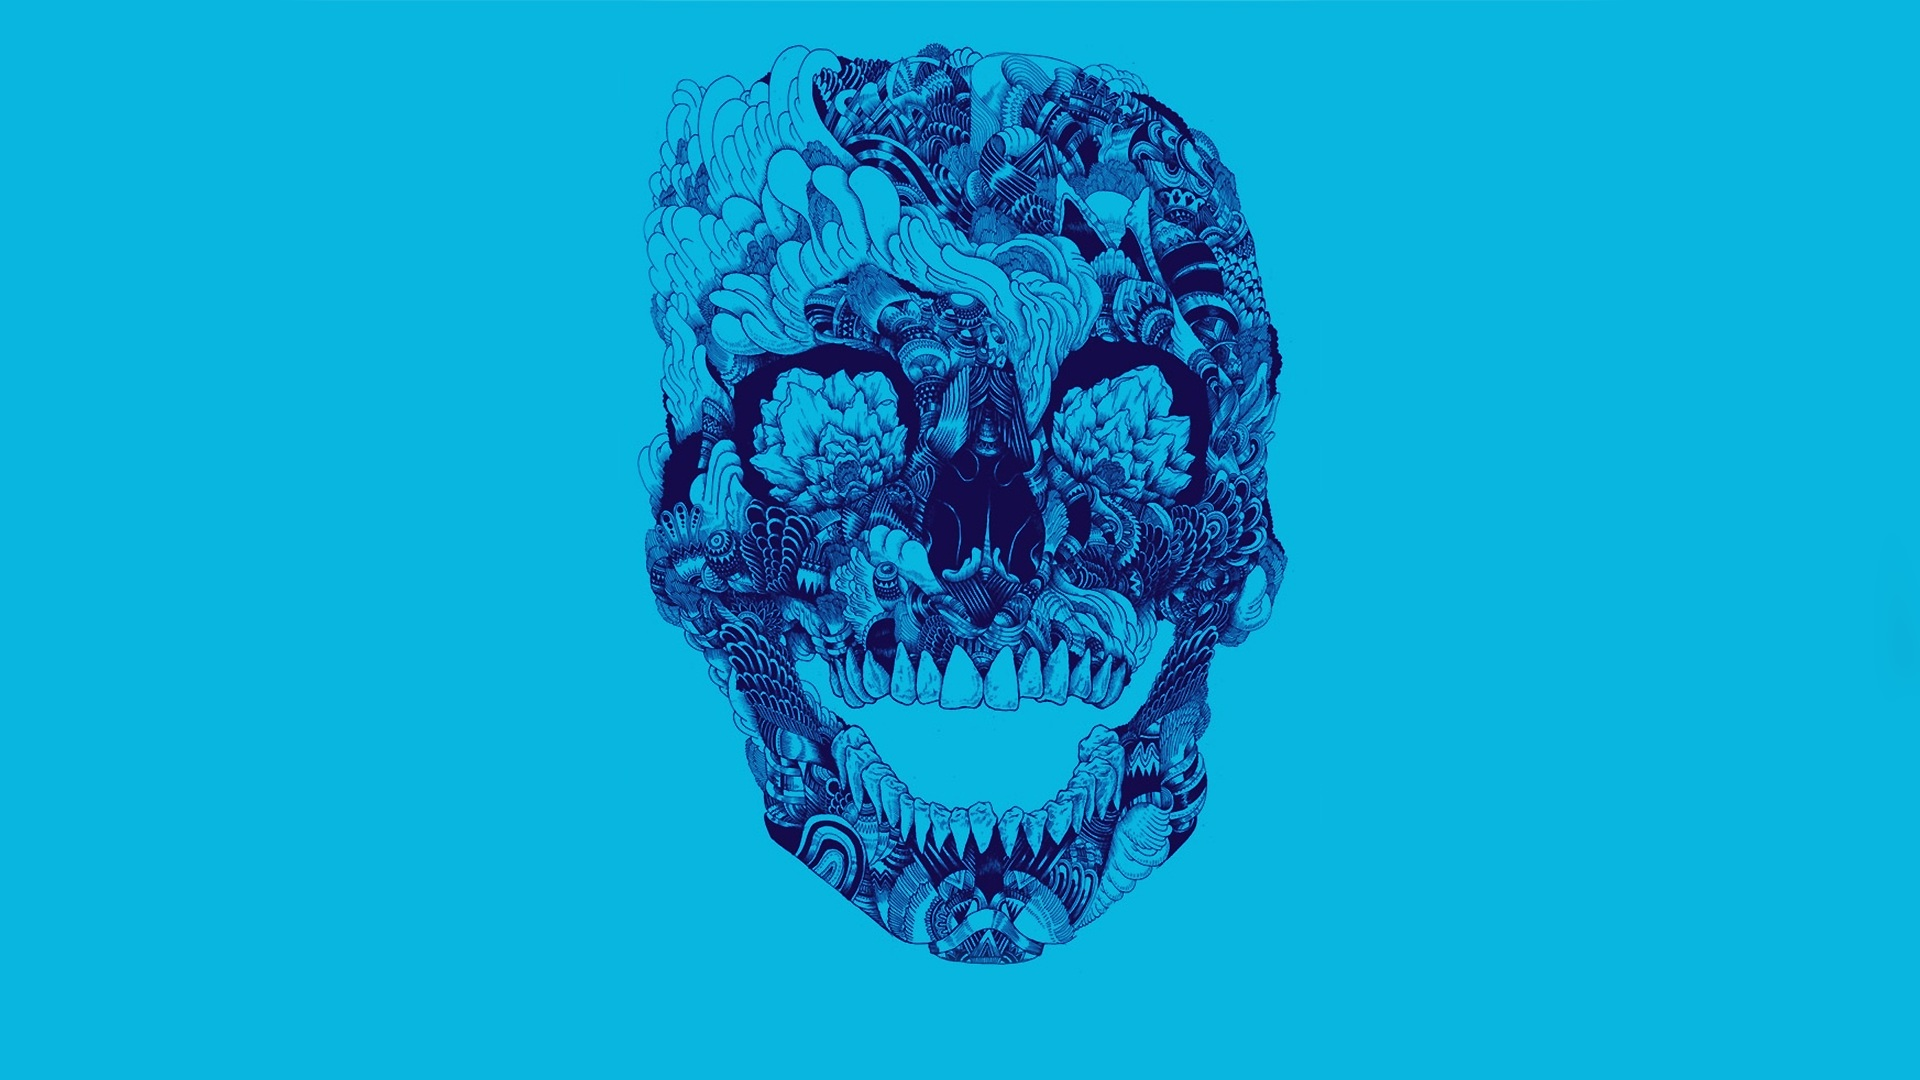 skulls indie HD Wallpaper   General 1262313 1920x1080